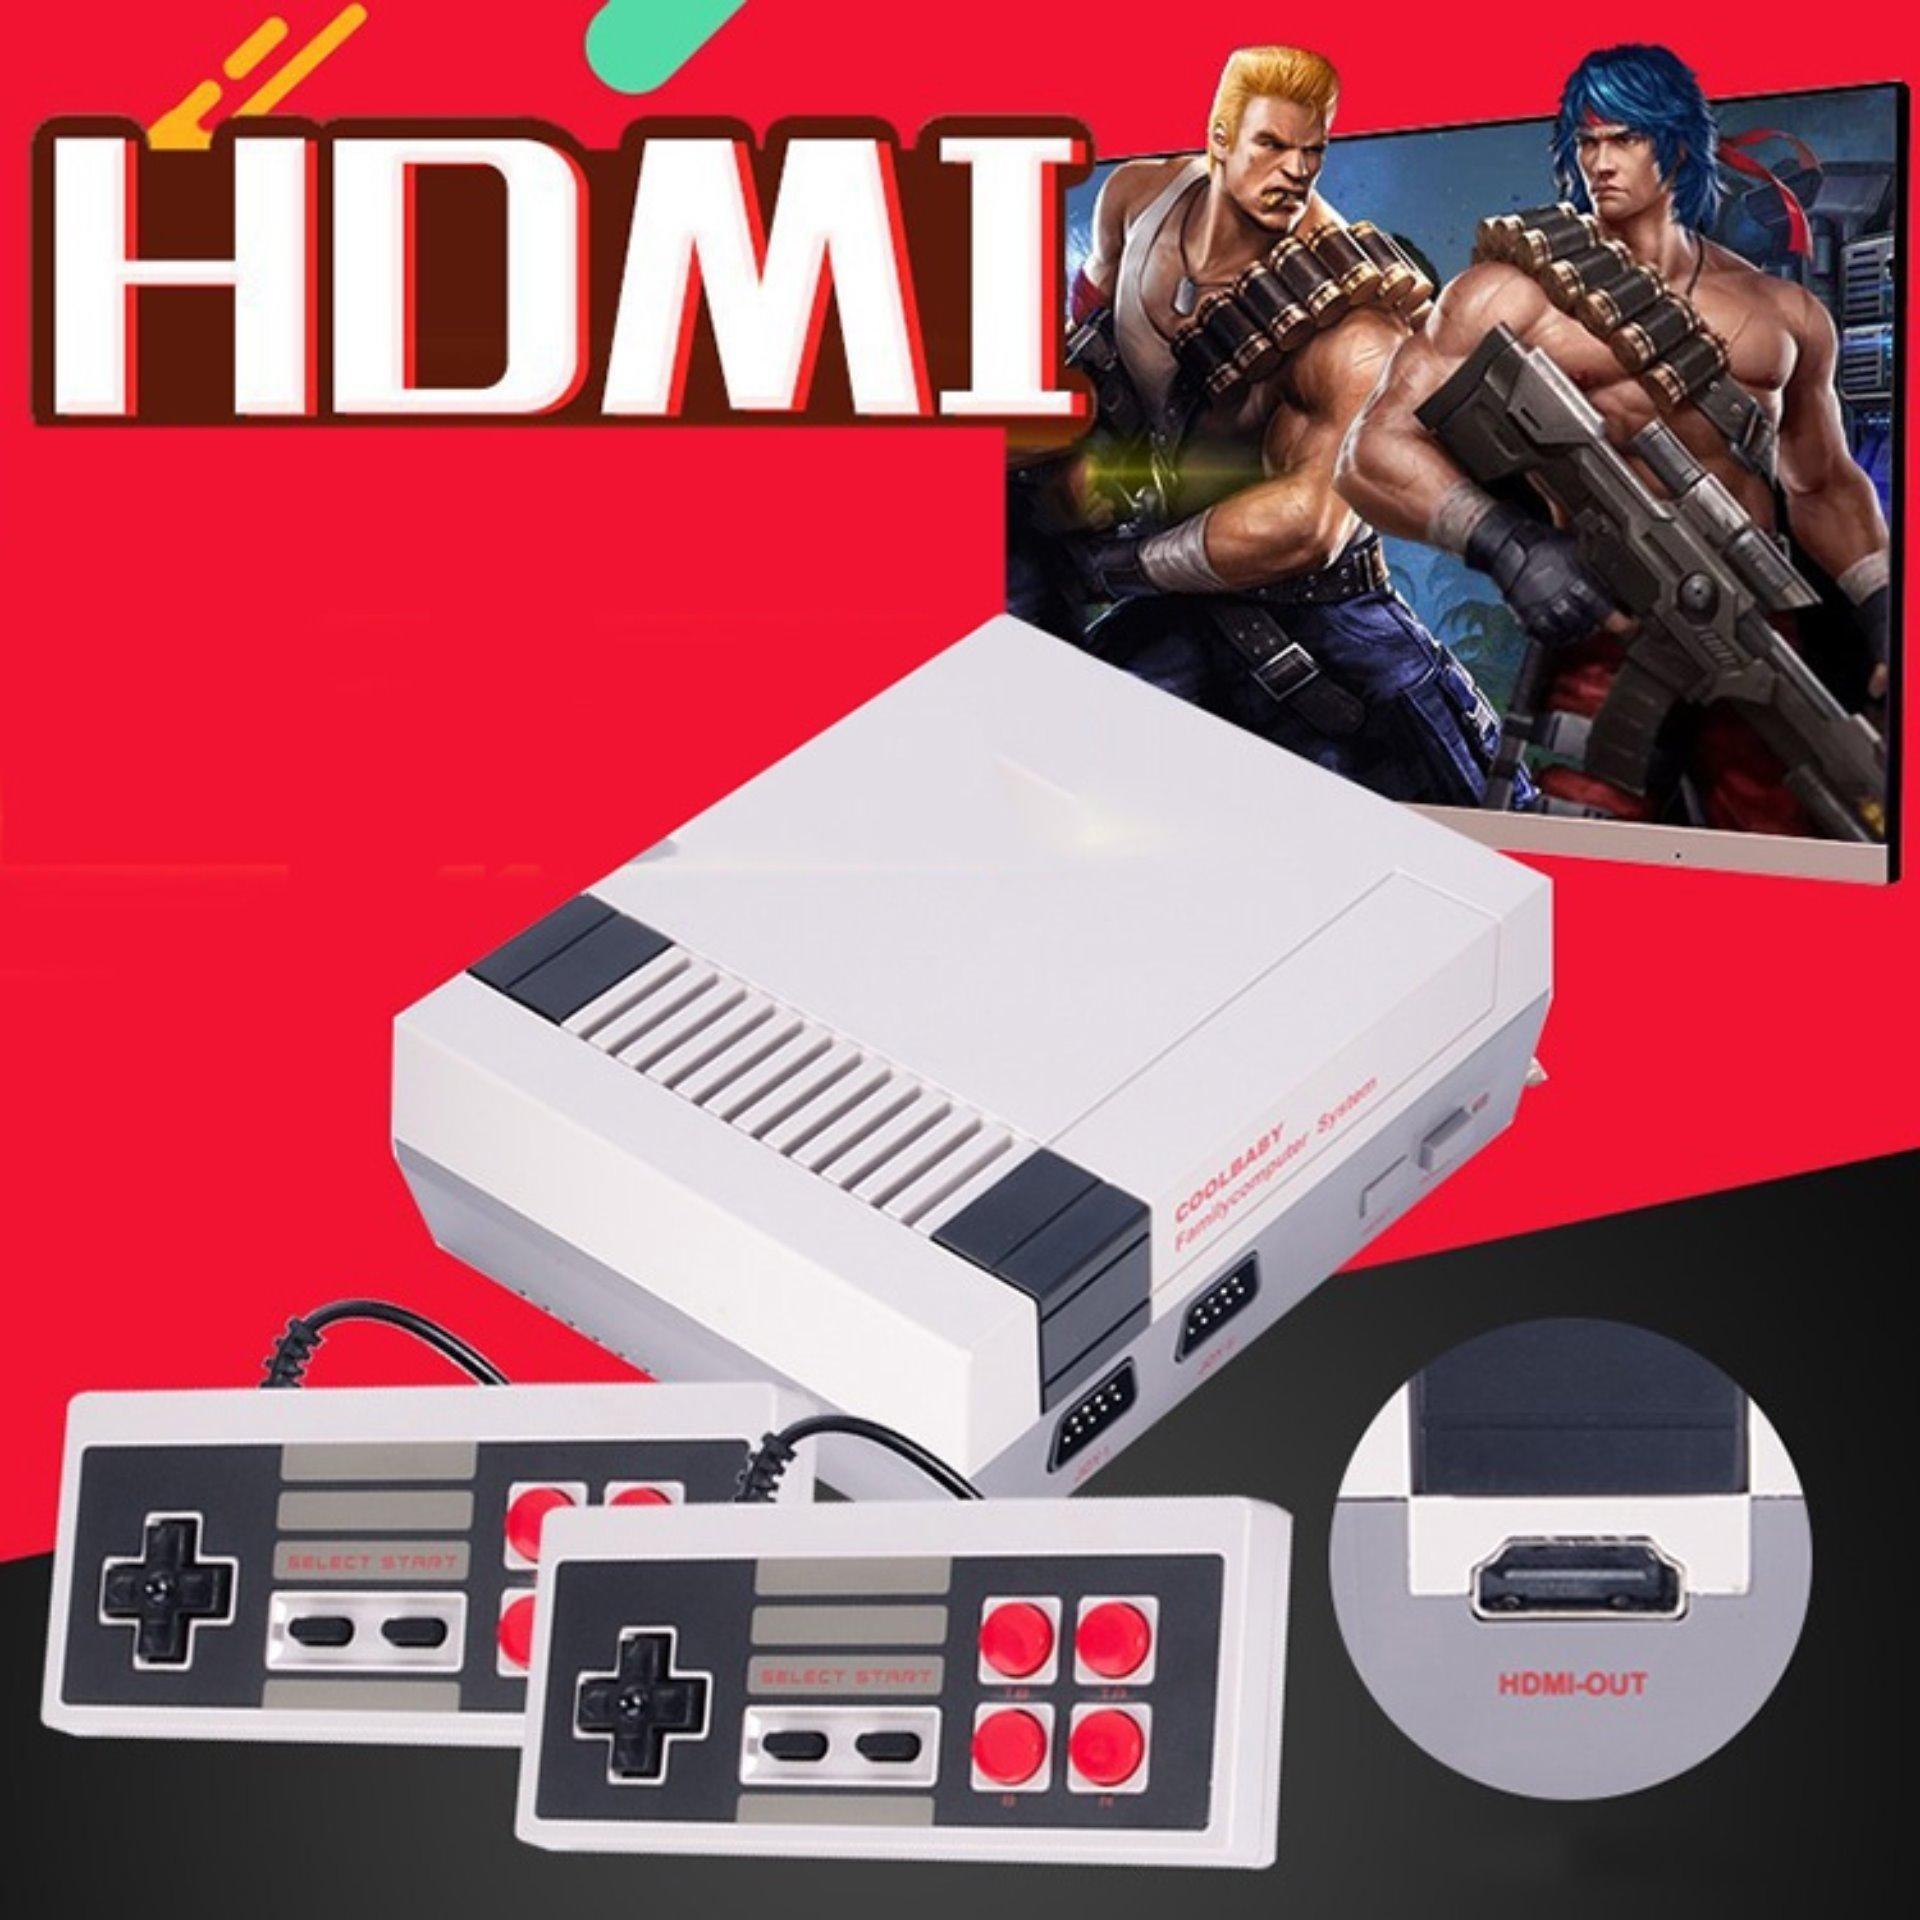 Retro Classic TV game console HDMI Built-in 600 Games